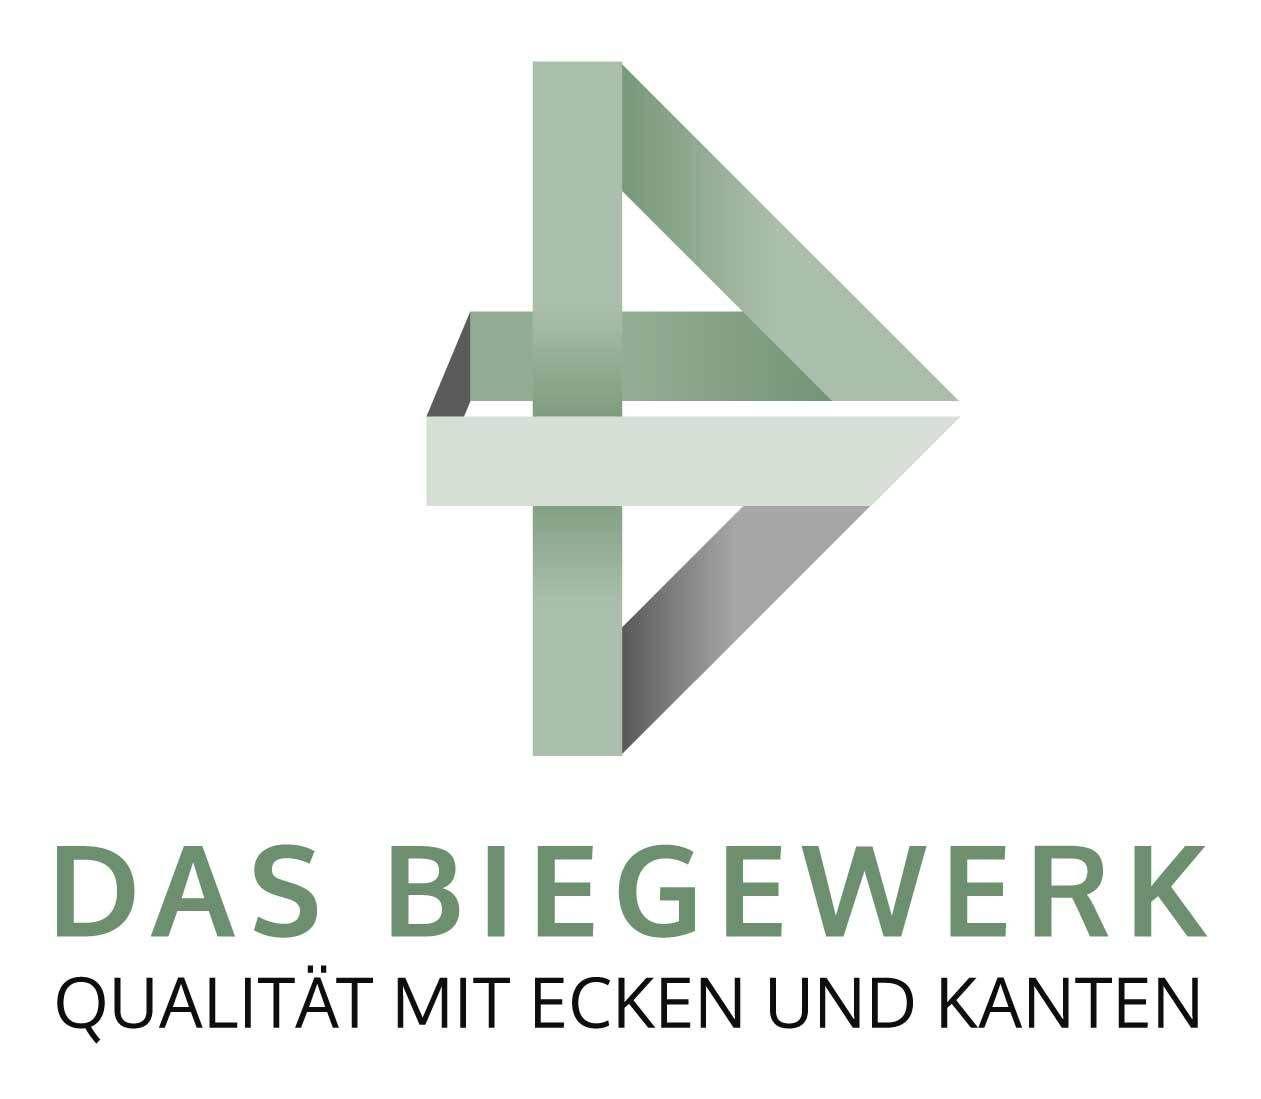 Handwerk | Gewerbeverein Cadenberge e. V.